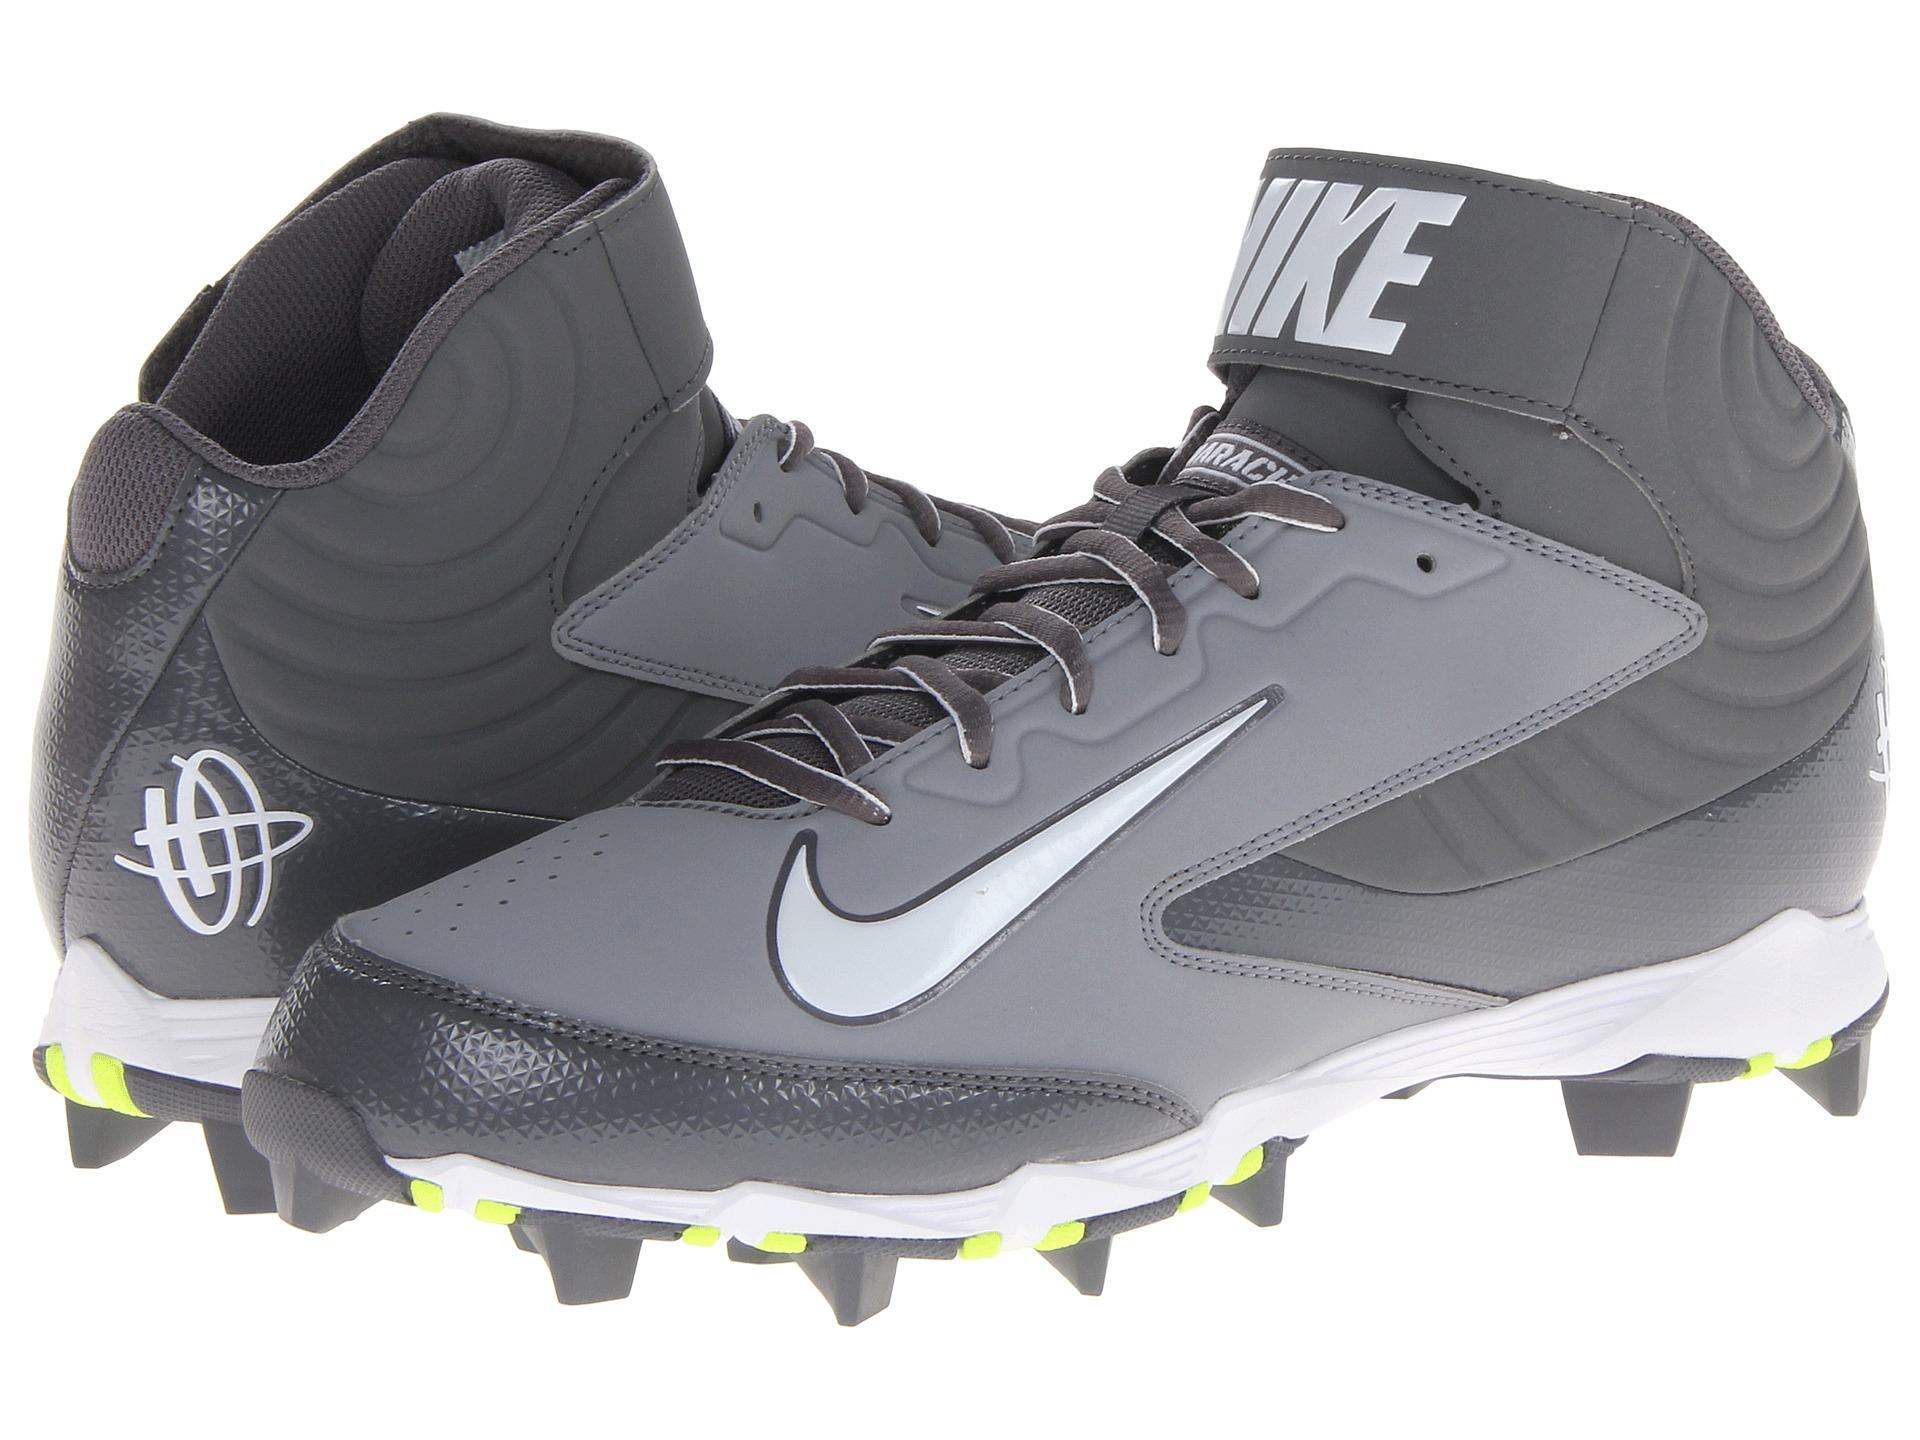 official photos aec6b 80f70 Lyst - Nike Huarache Keystone Mid in Gray for Men